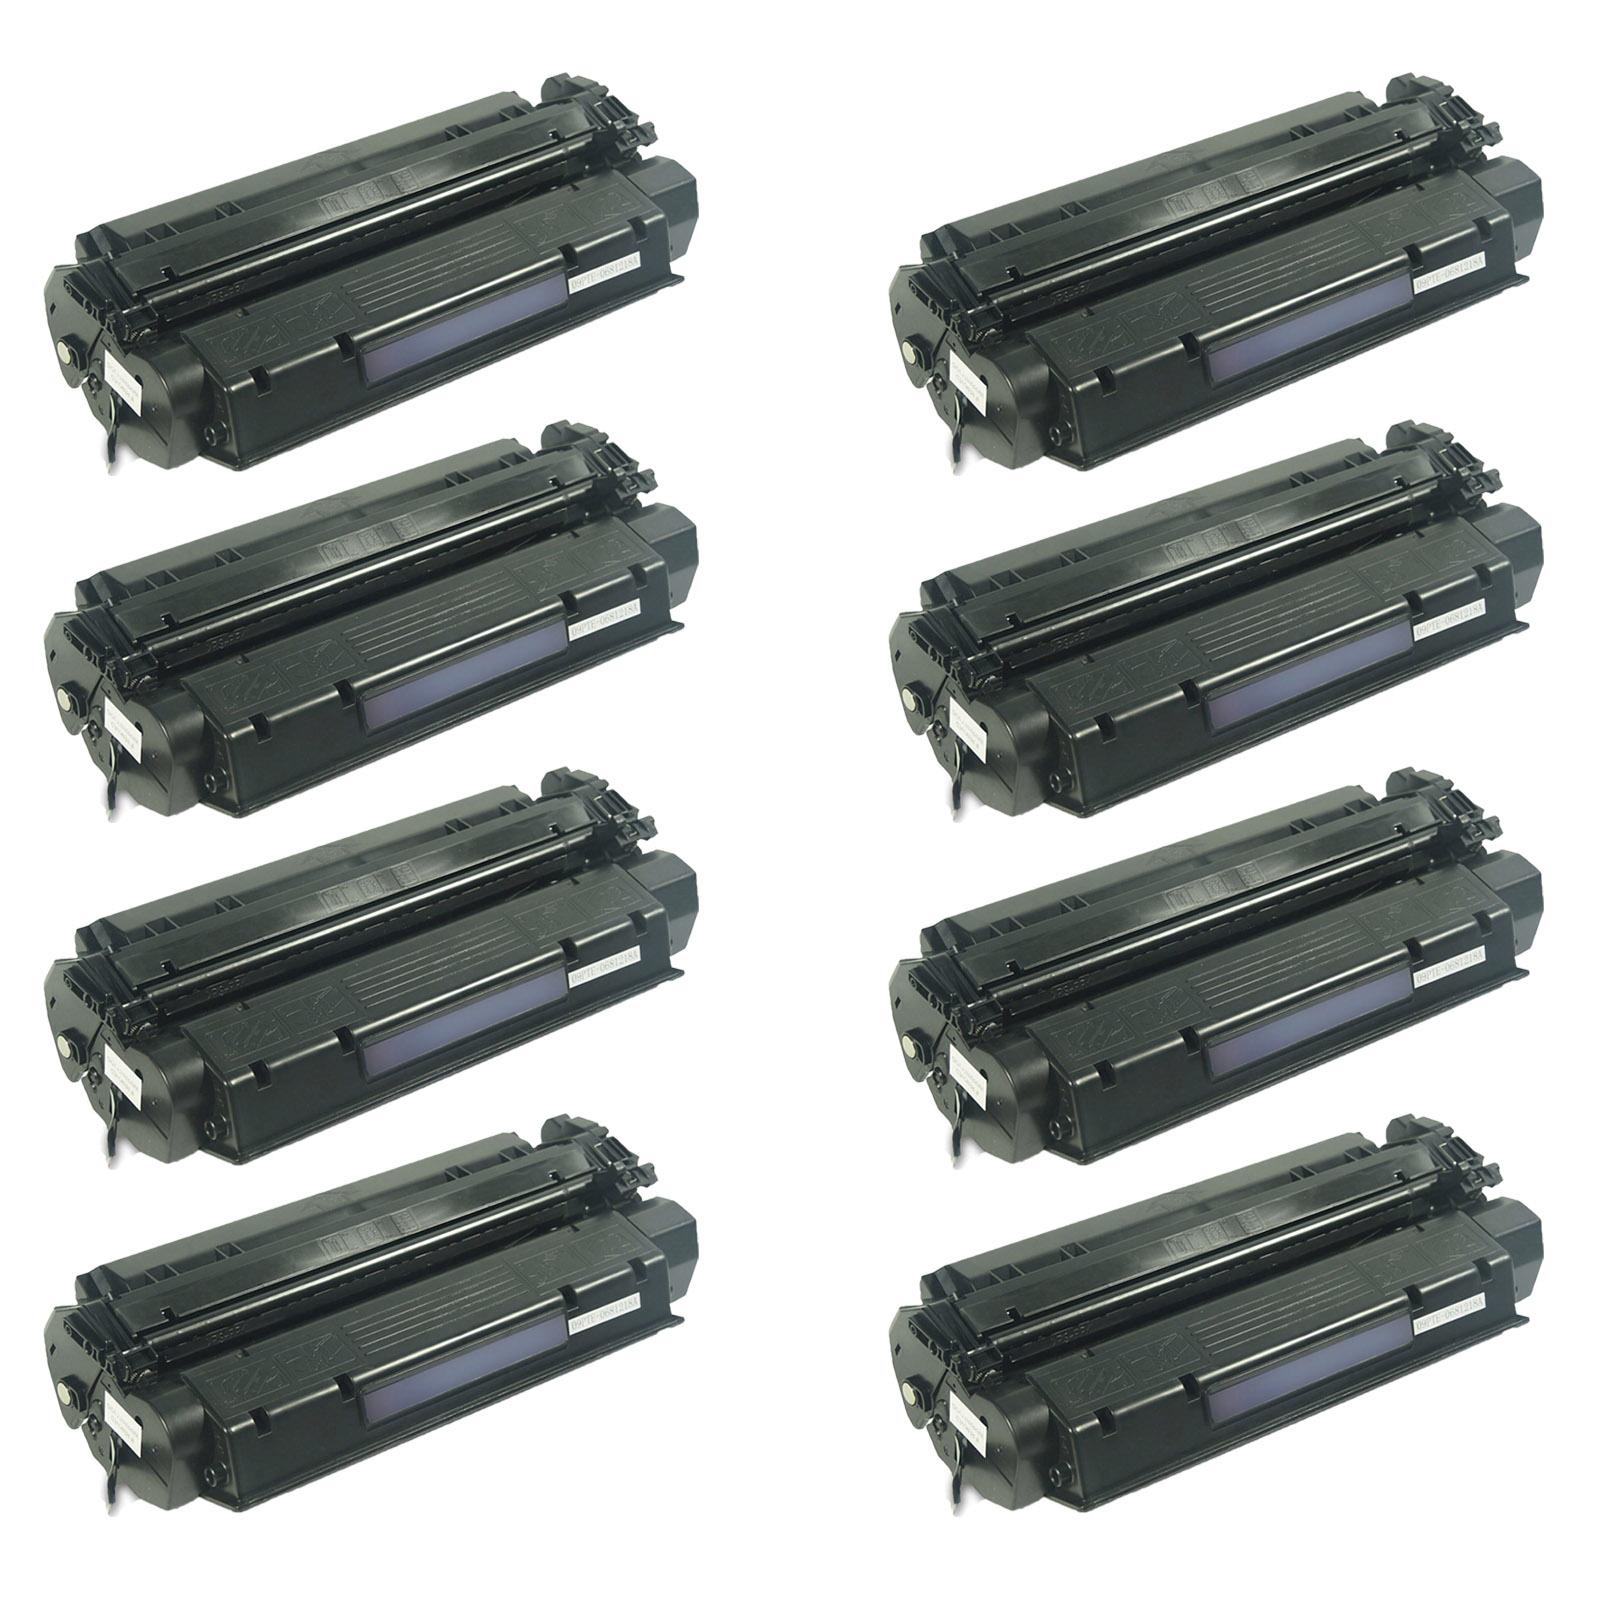 6 PK Compatible C7115X 15X Toner Cartridge For LaserJet 3300 3320n 1200 1000